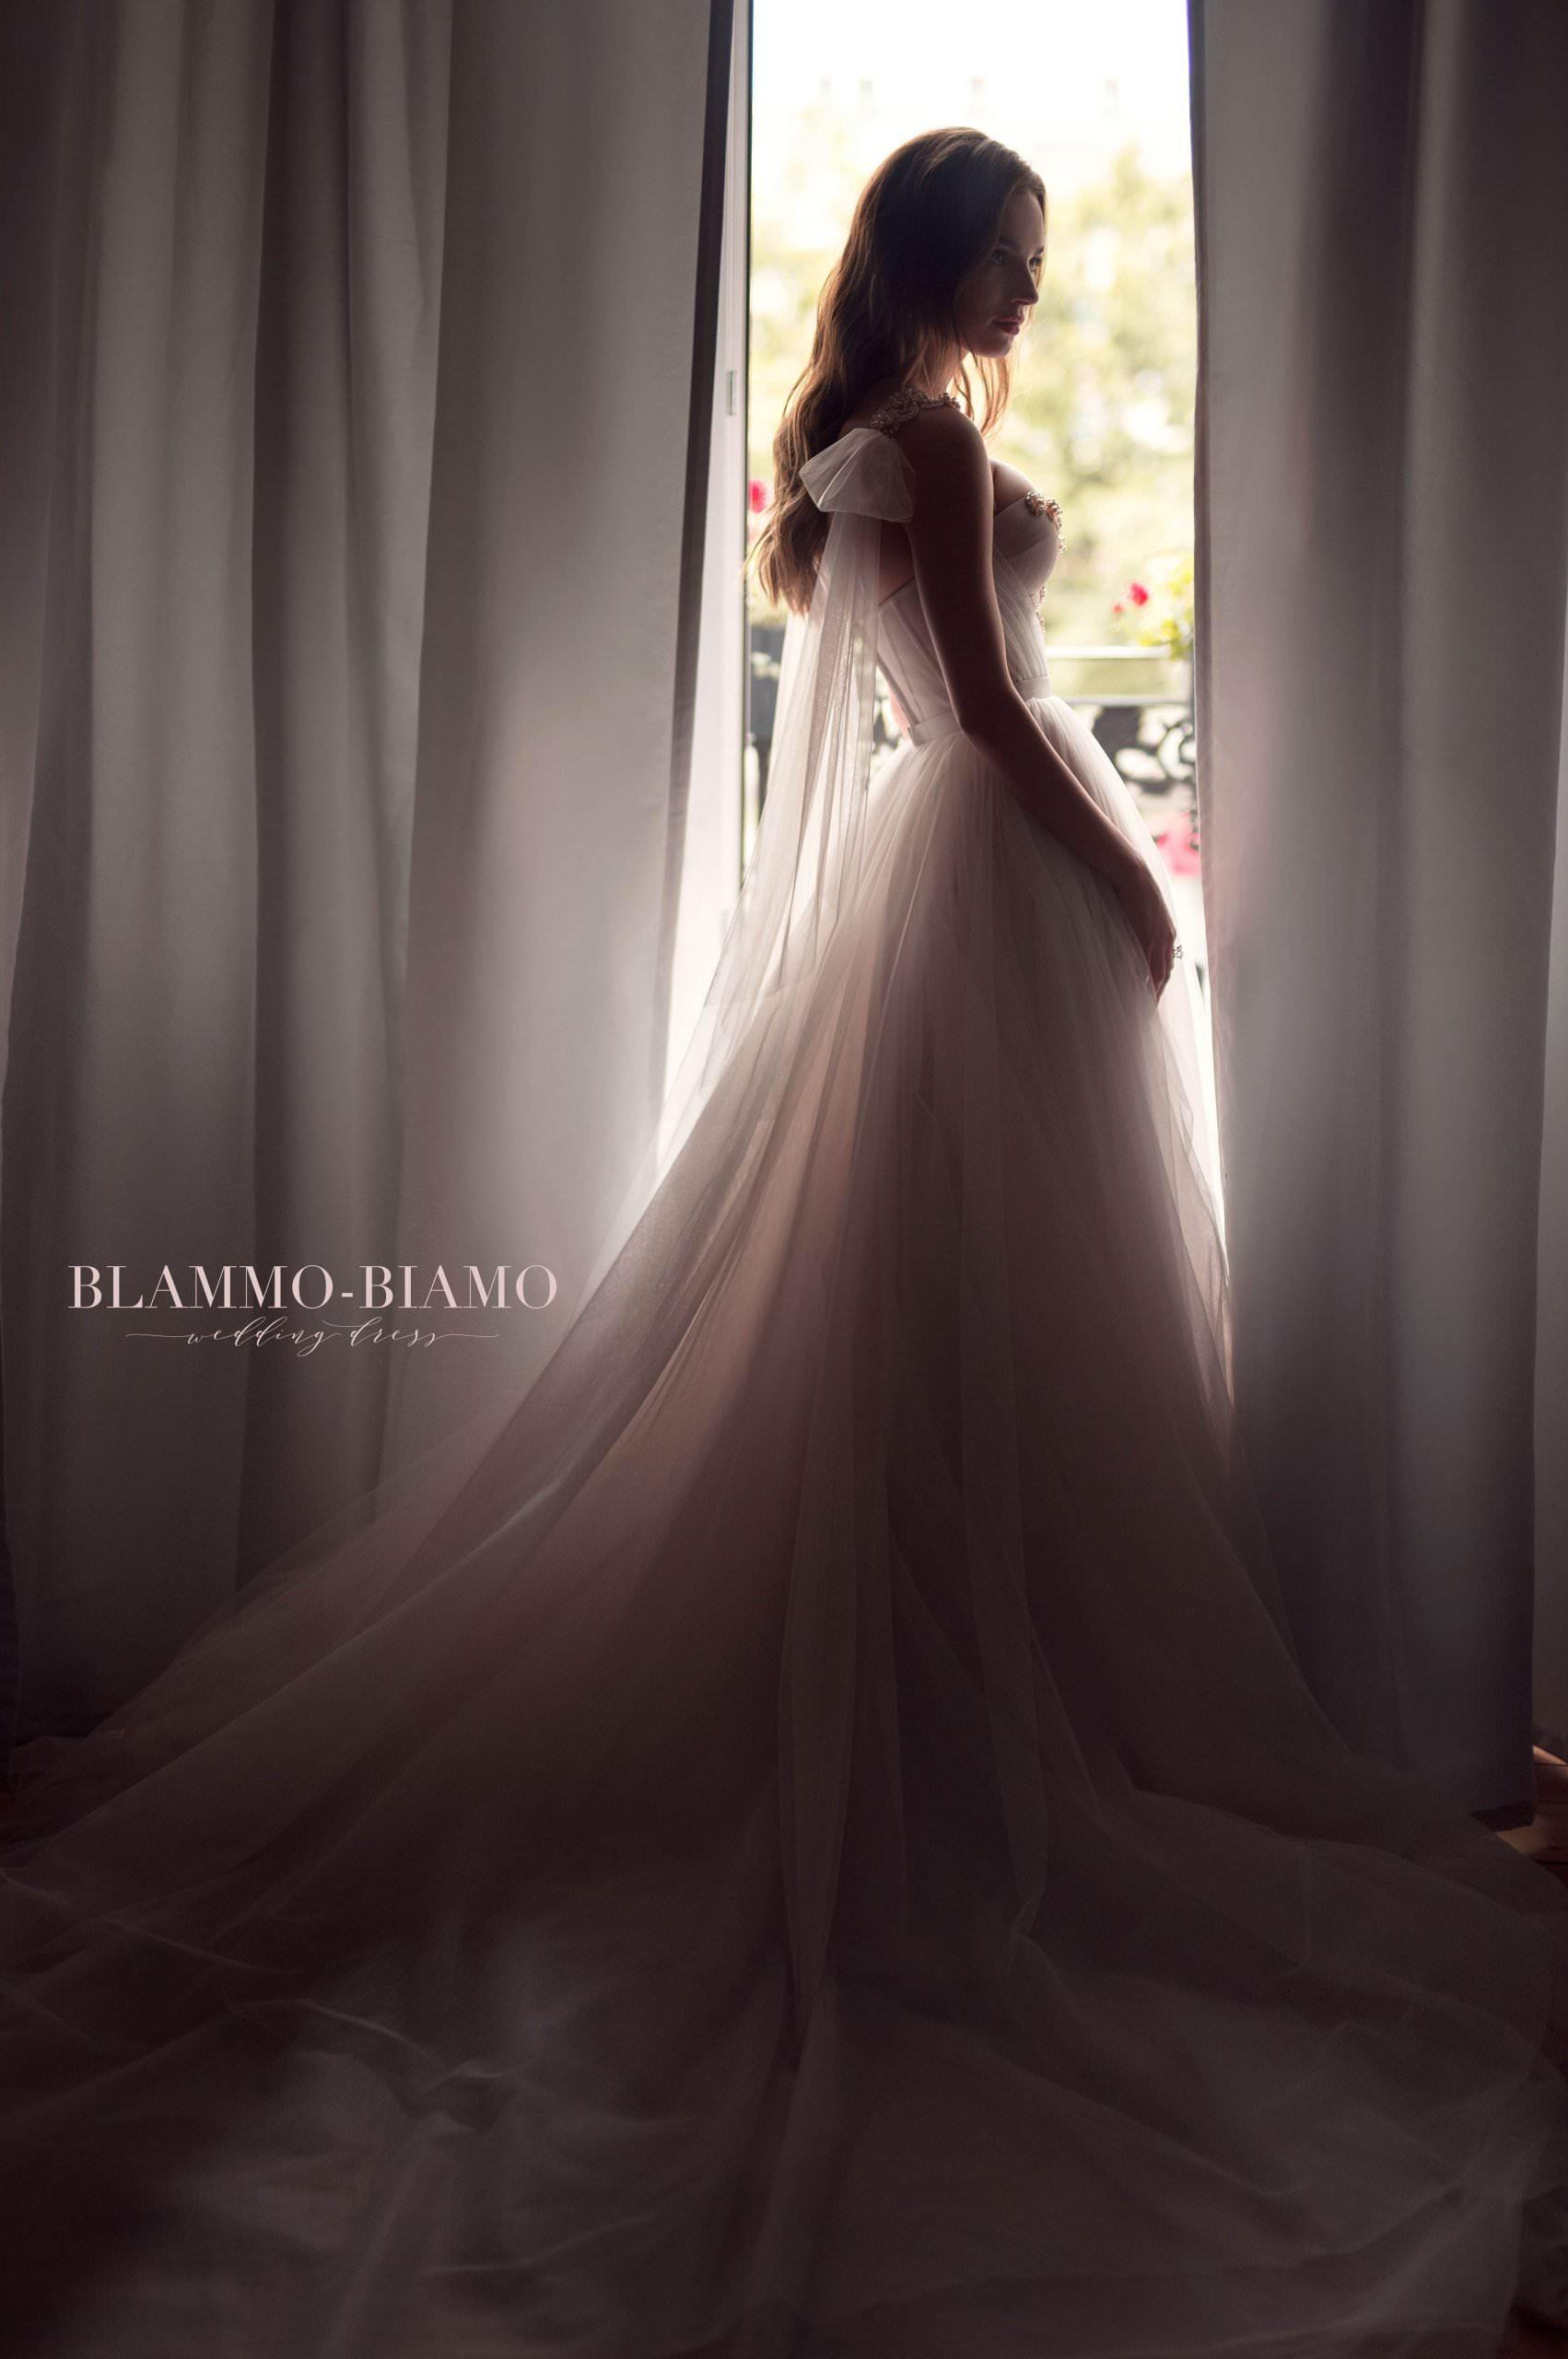 Wedding gown Blammo-Biamo Nora